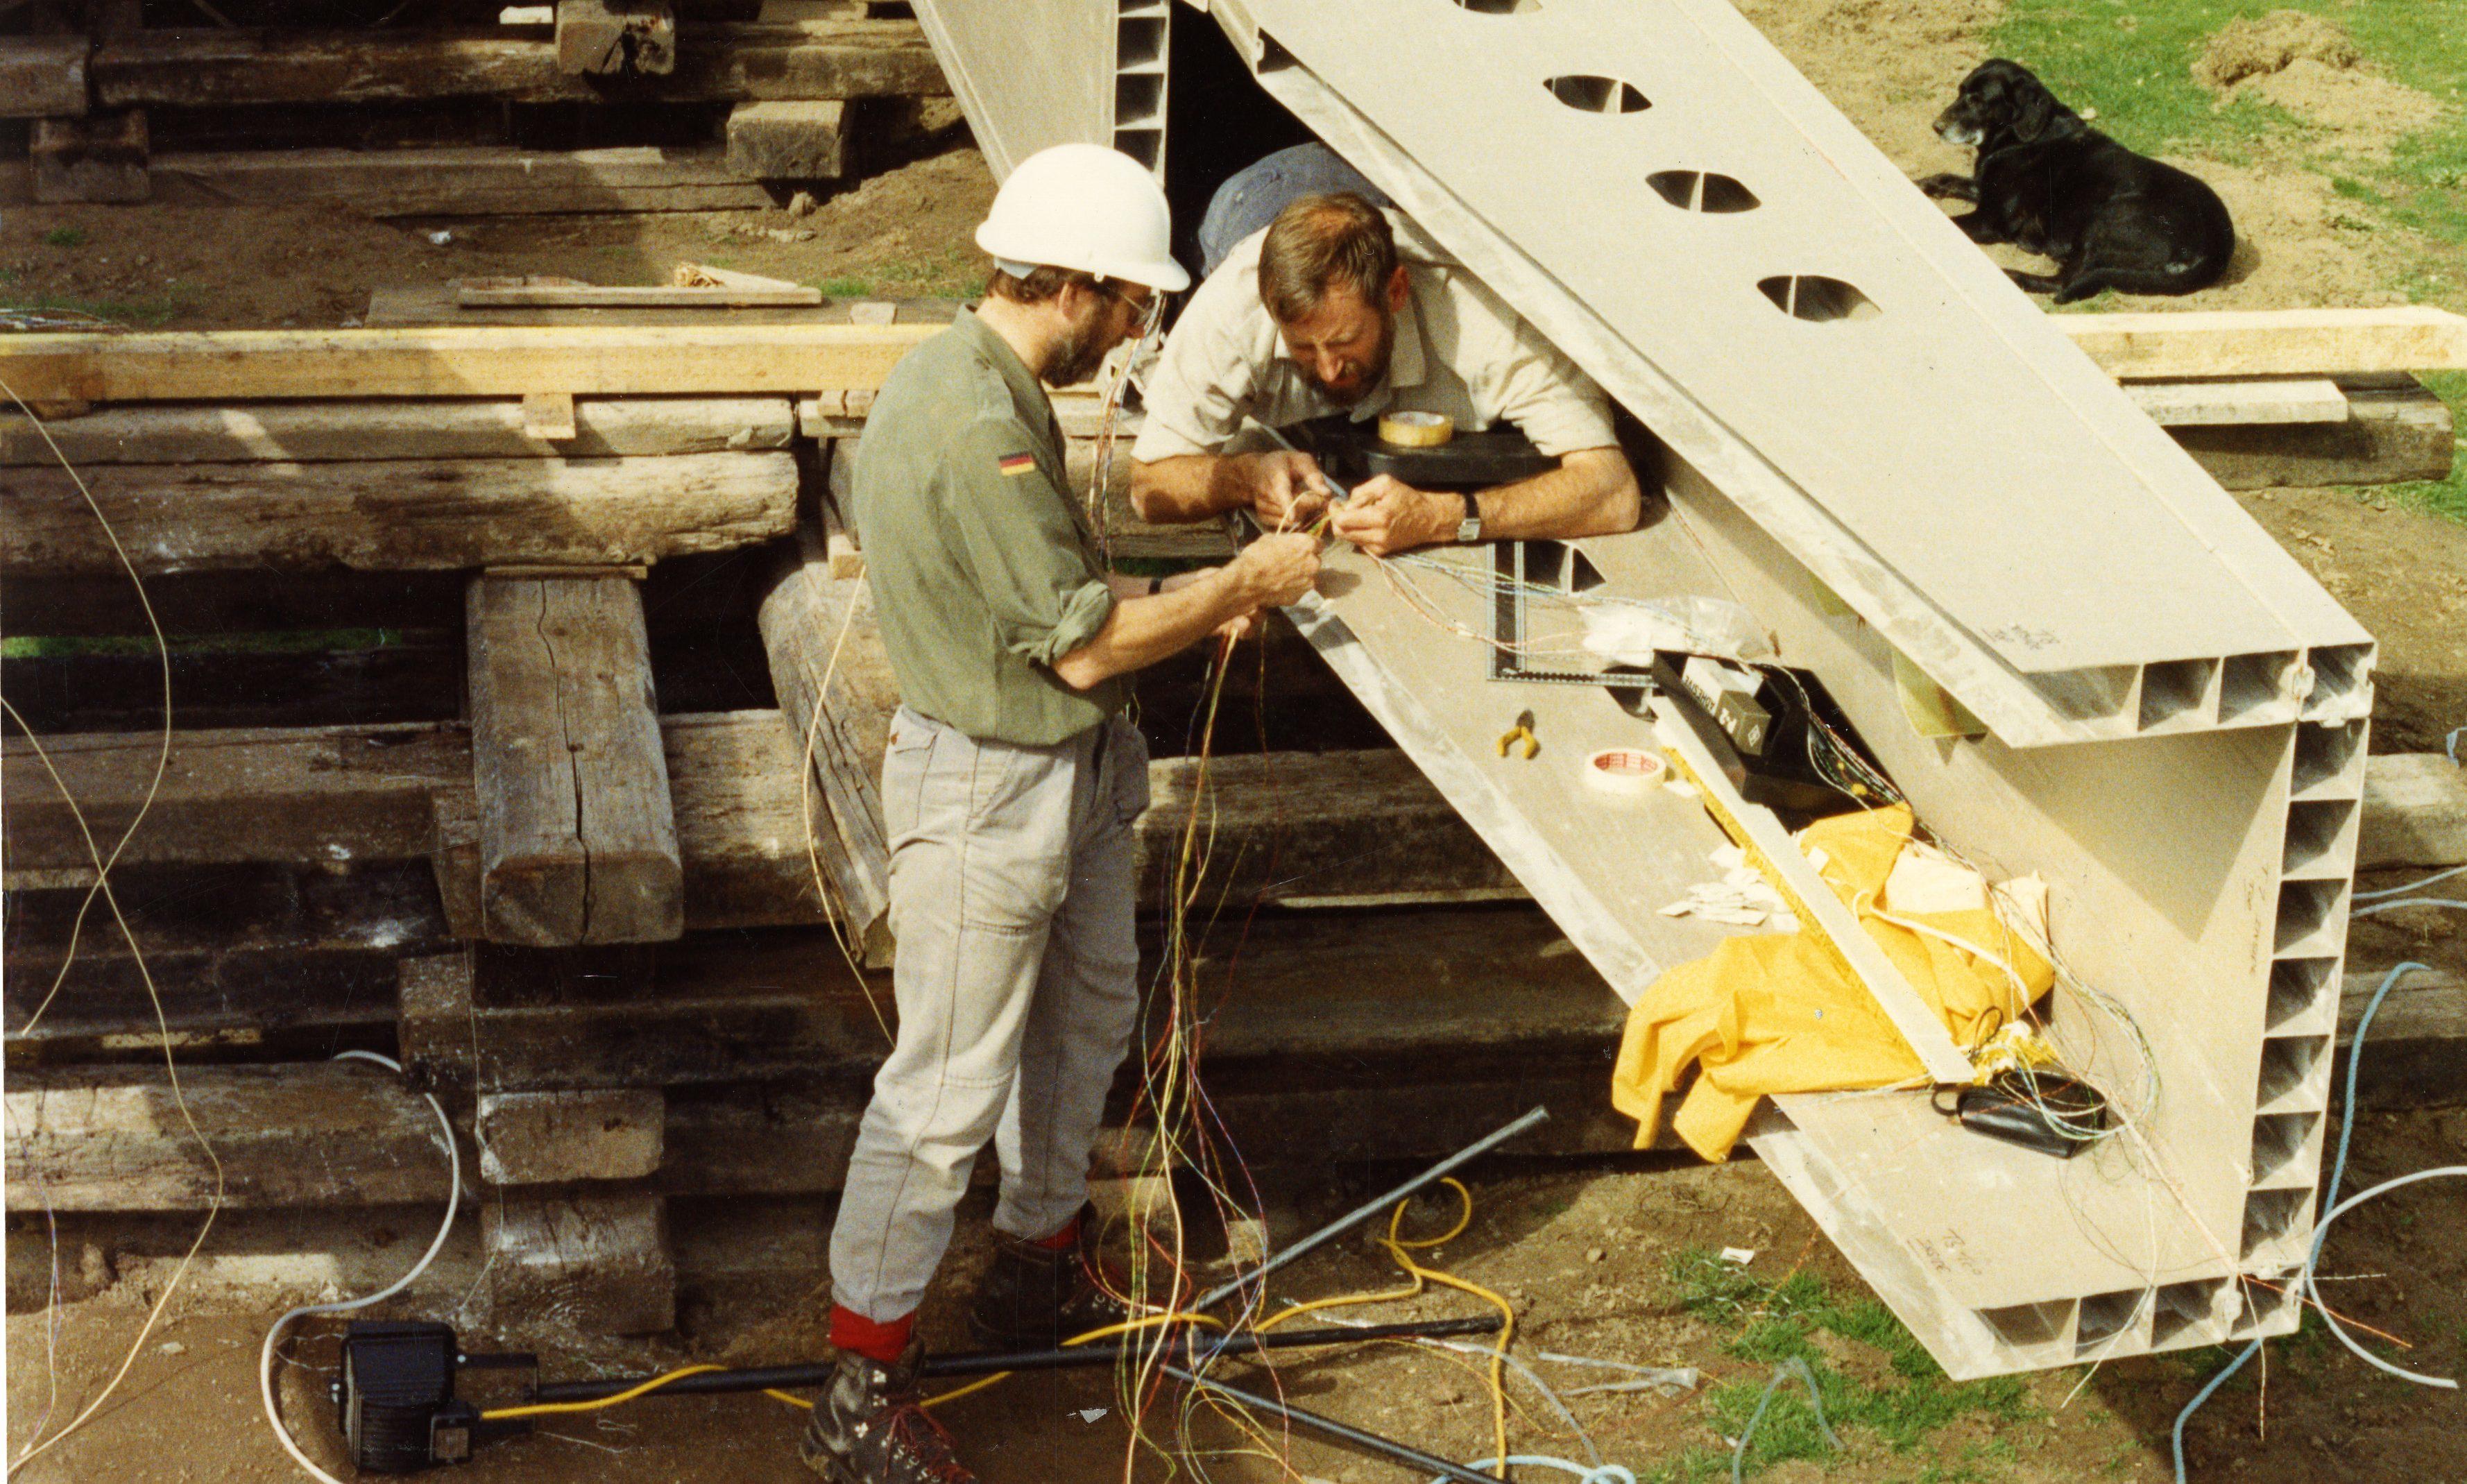 The bridge under construction in 1992.